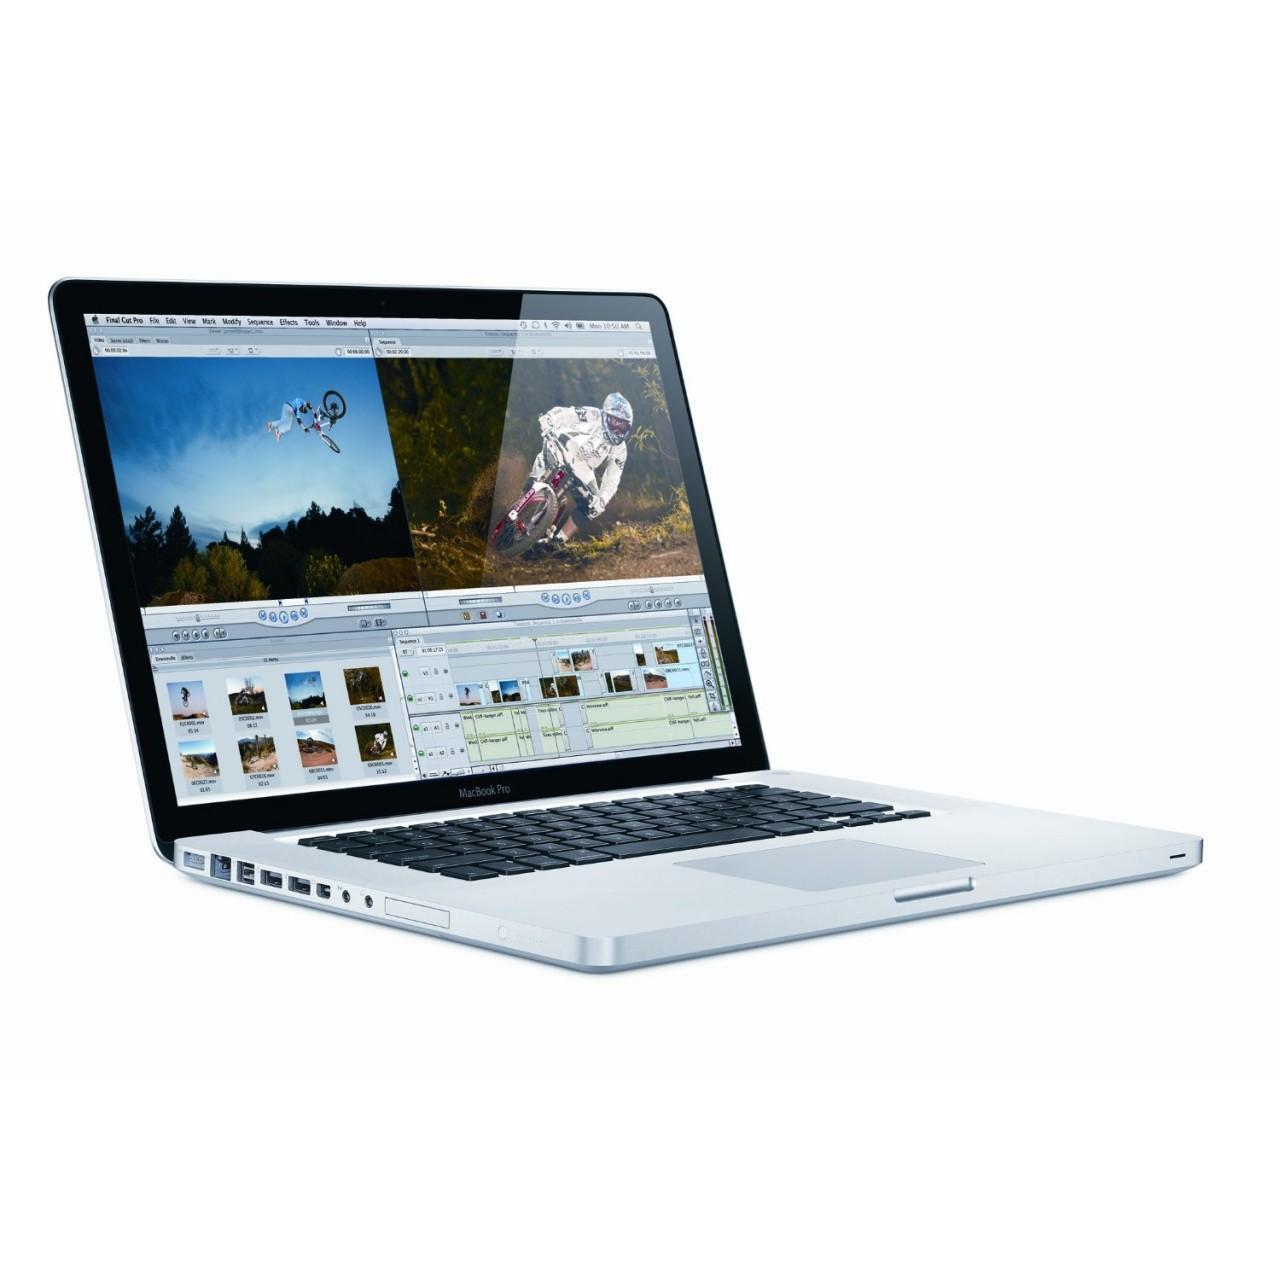 "MacBook Pro 13"" Core 2 Duo 2,26 GHz - HDD 250 Go - RAM 2 Go"